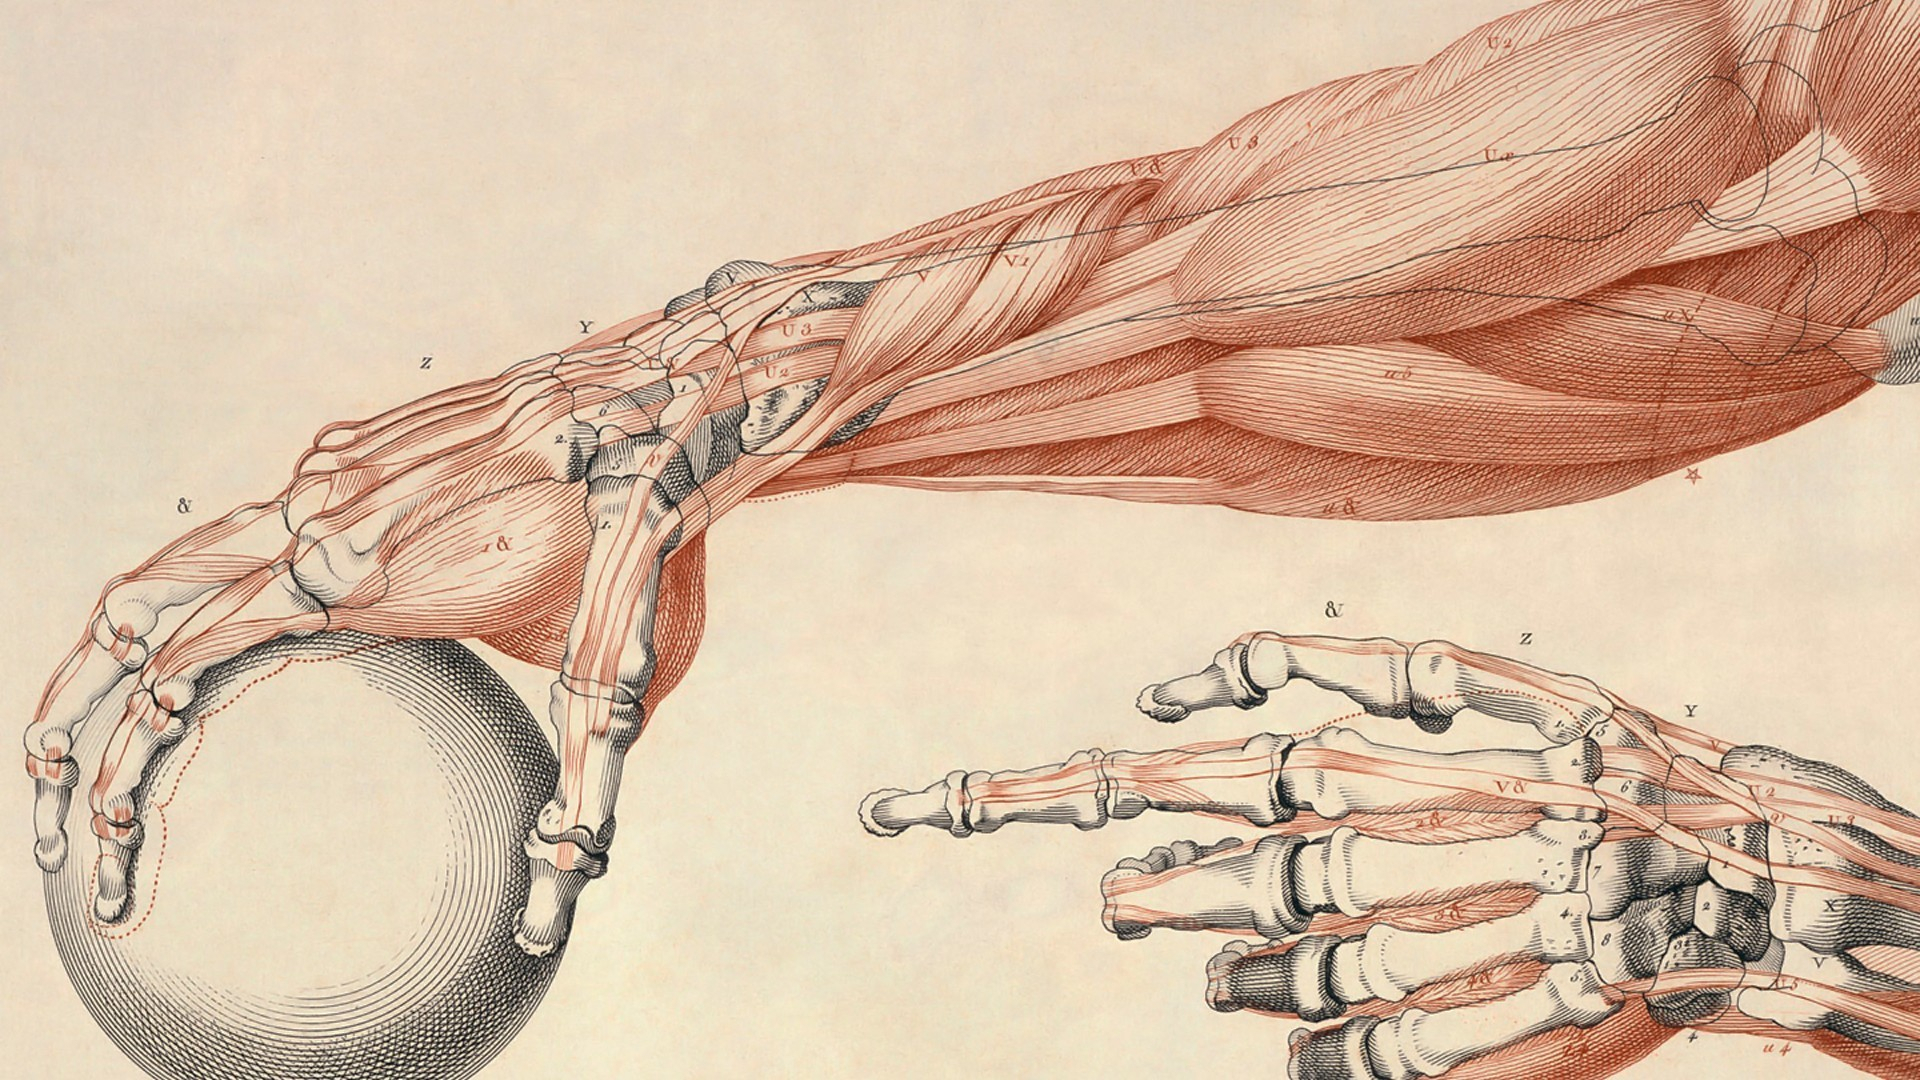 68+ human anatomy wallpapers on wallpaperplay